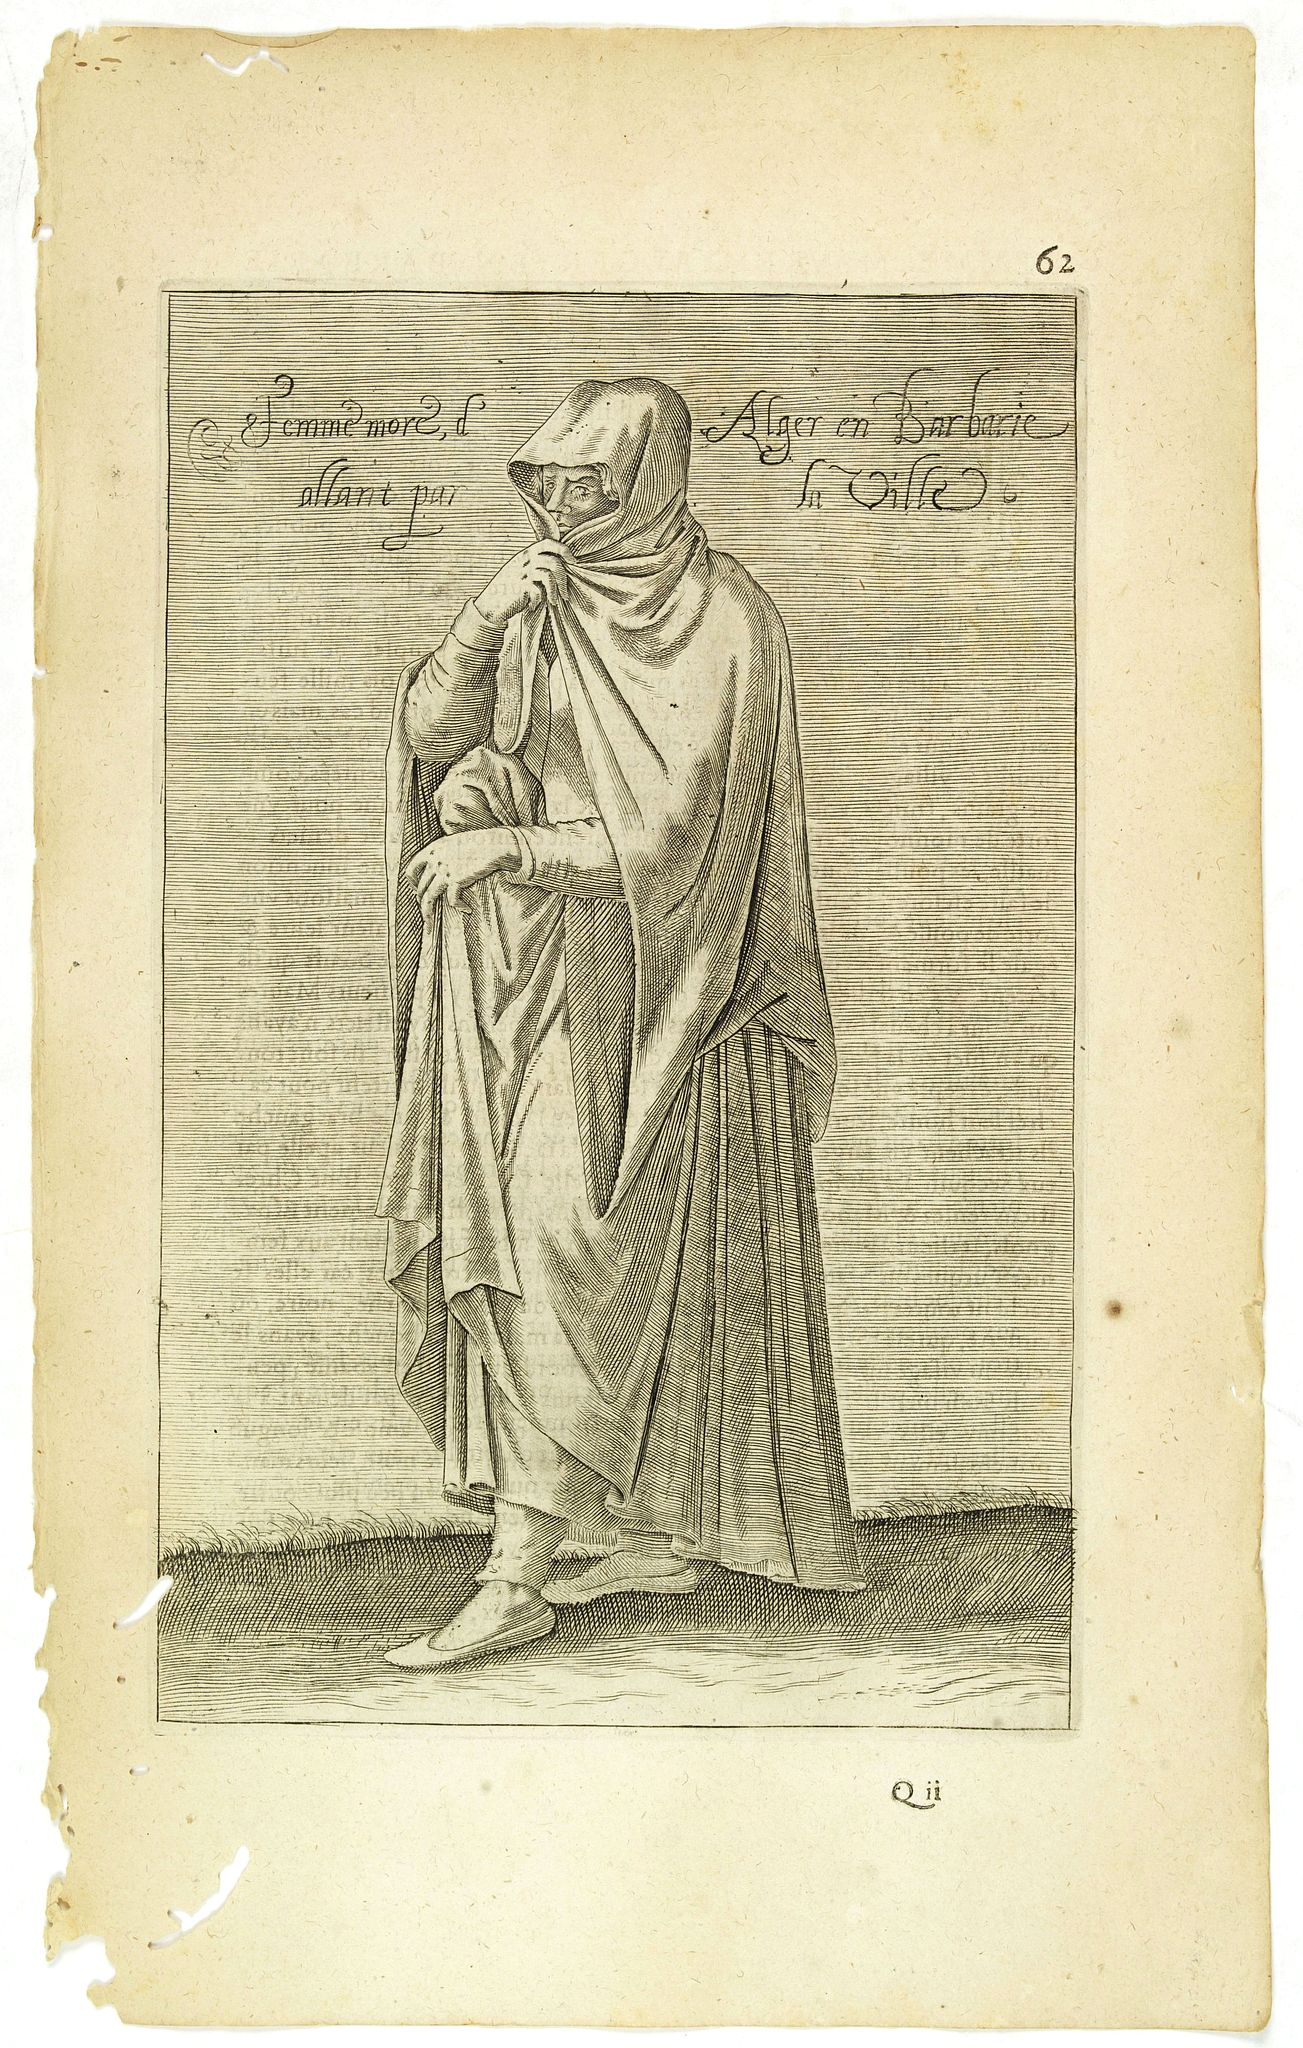 NICOLAS DE NICOLAY, Thomas Artus (sieur d'Embry). -  Femme More d